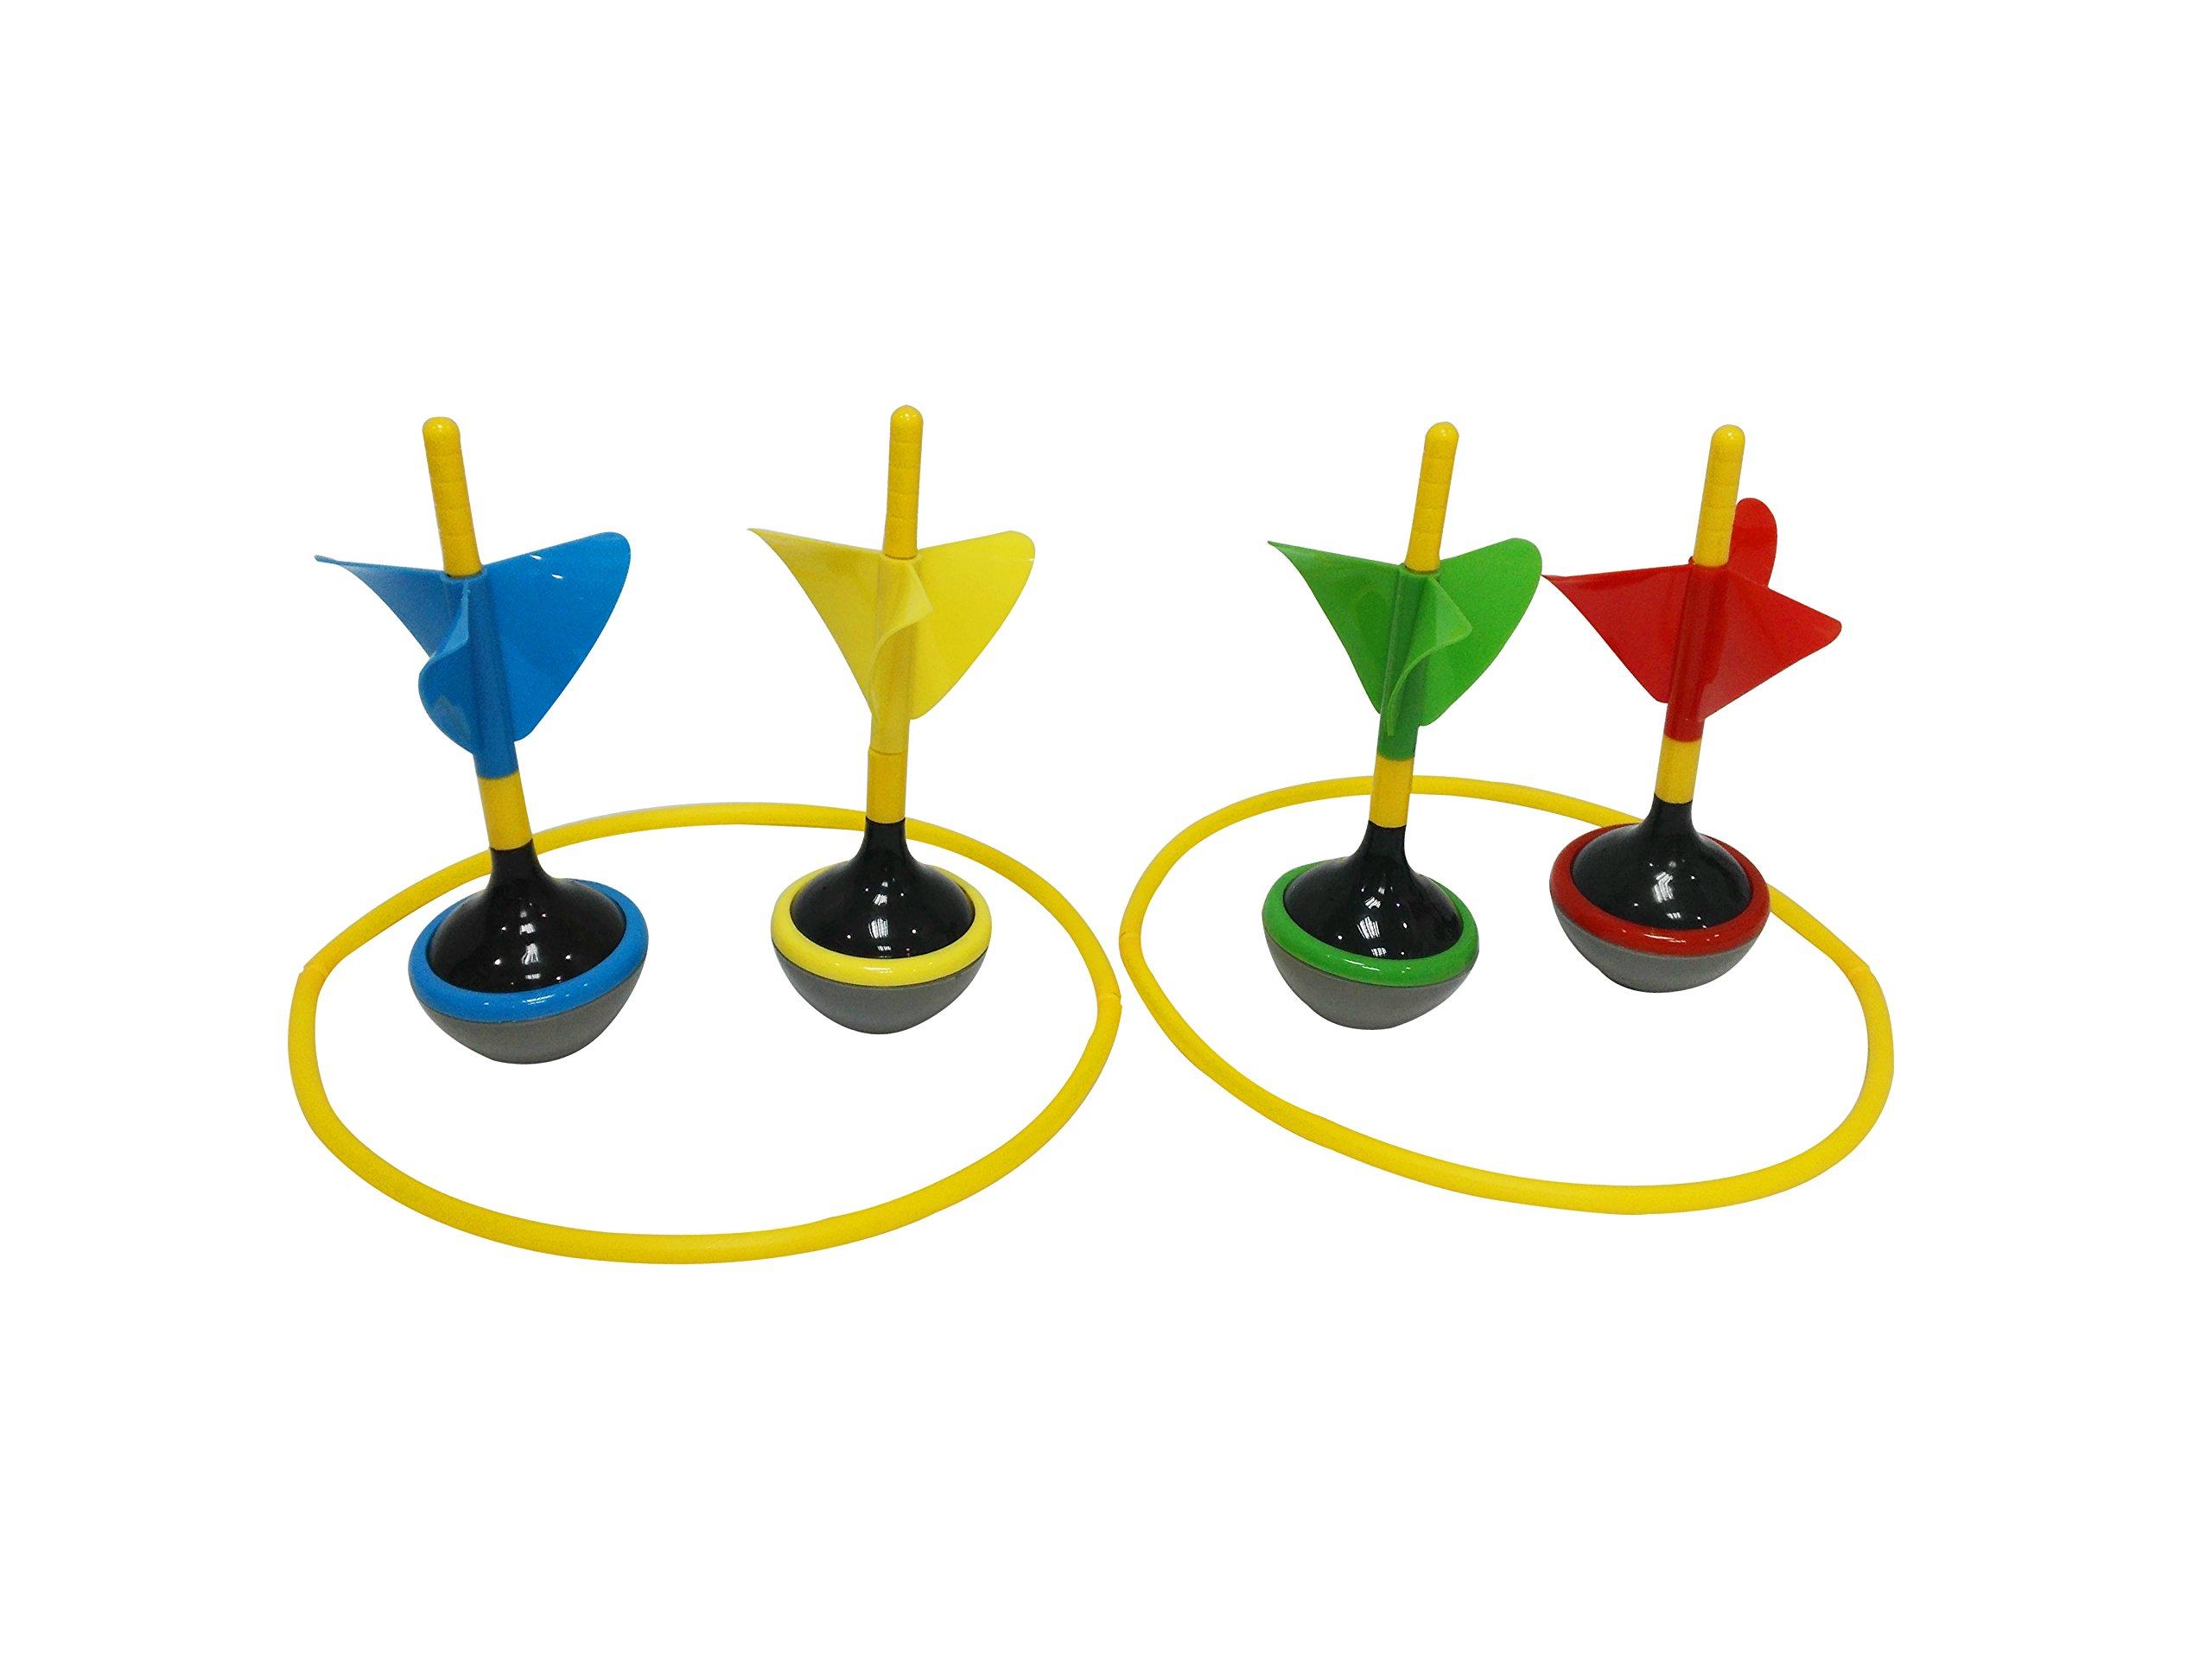 Heemika 4 Pcs Lawn Dart Game Set,Garden Outdoor Family Fun Dart Toss Games